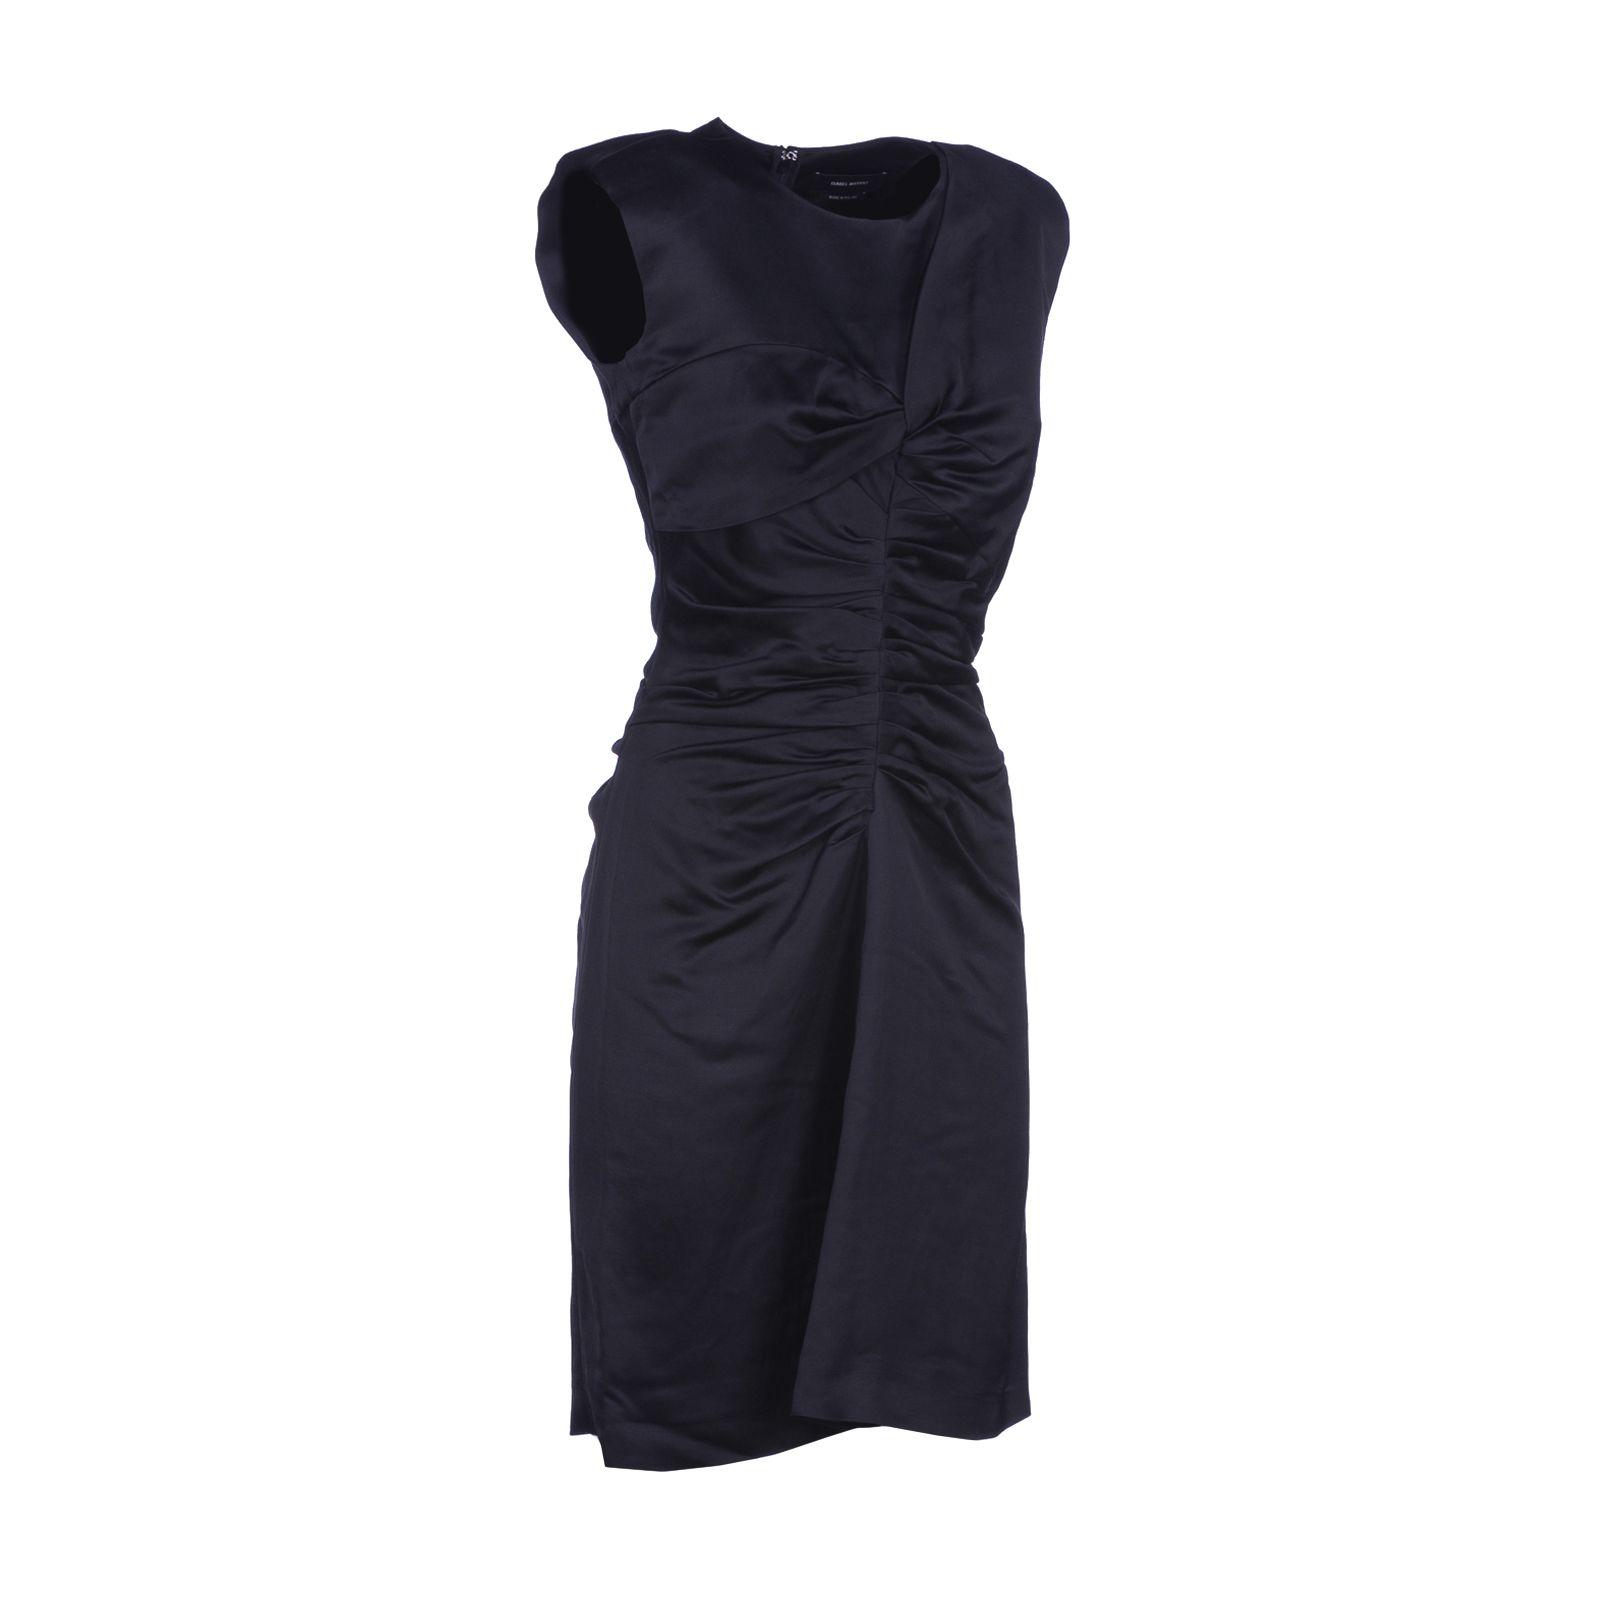 Isabel marant isabel marant esta dress black women 39 s for Isabel marant shirt dress